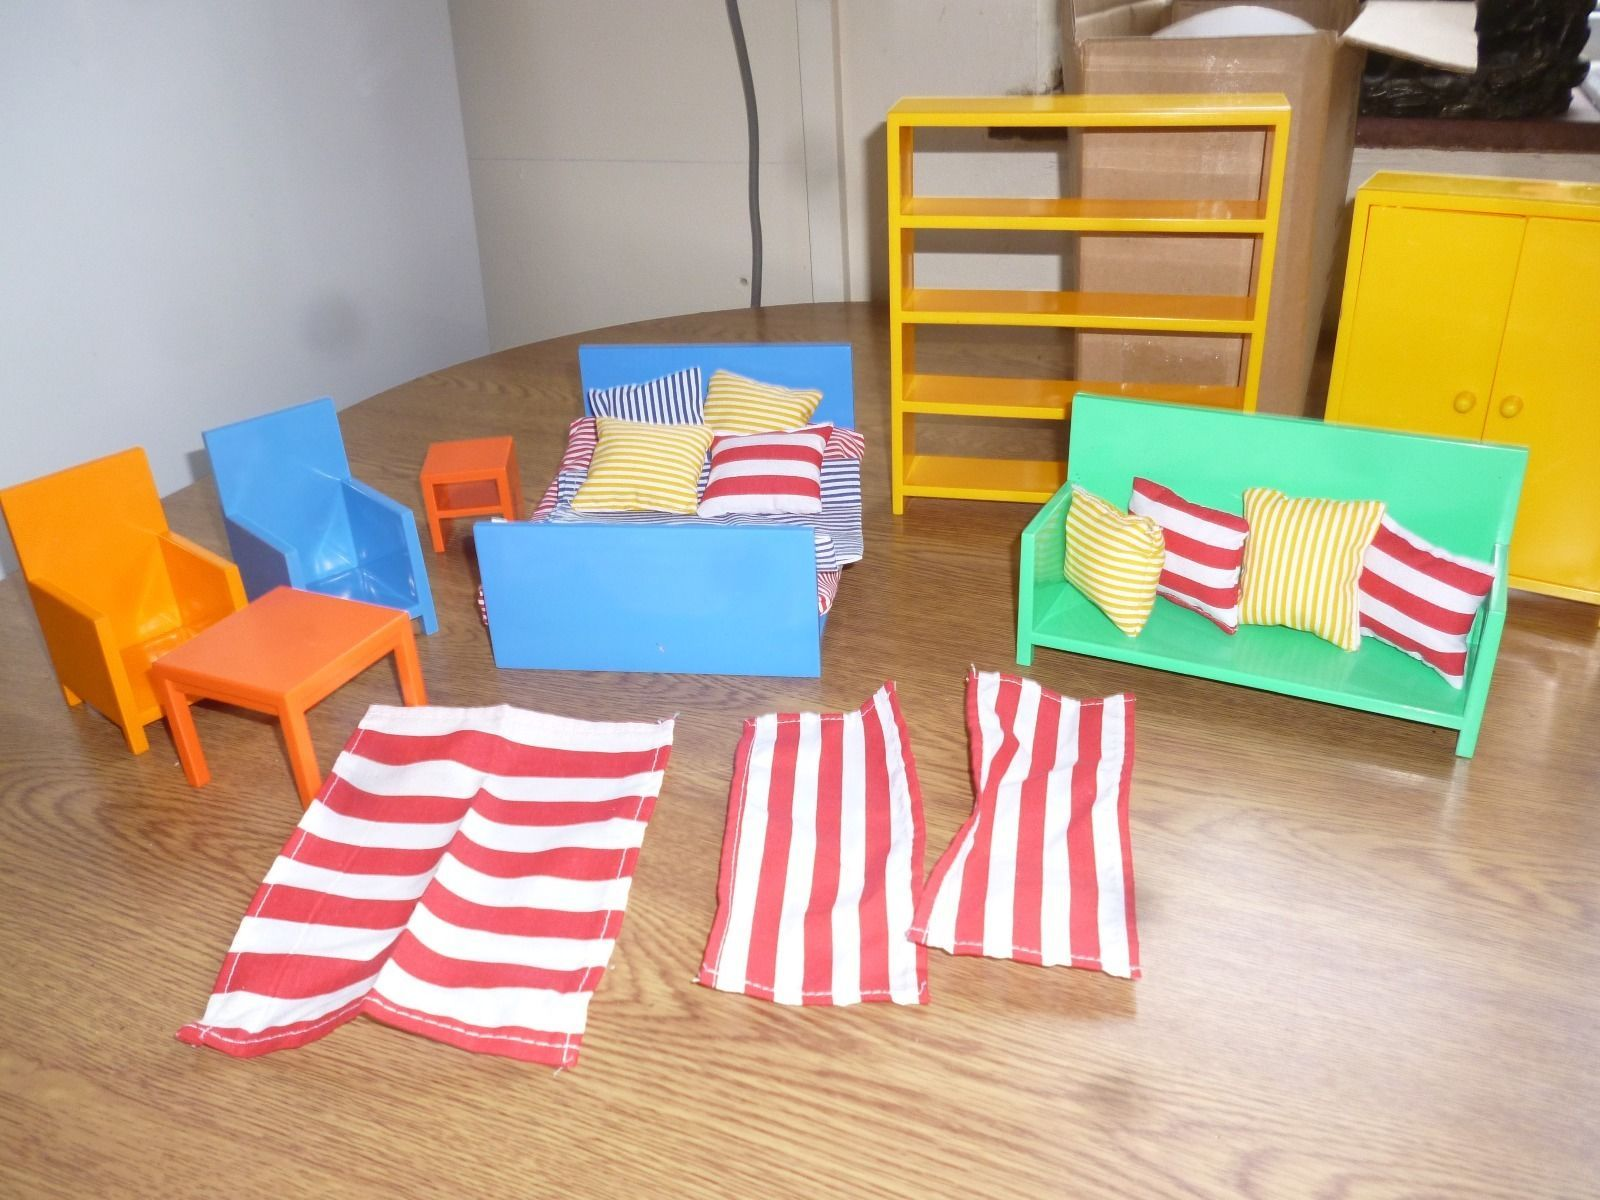 ikea dollhouse furniture. Ikea Dolls House Furniture. Furniture Mixed Bundle | Ebay Dollhouse